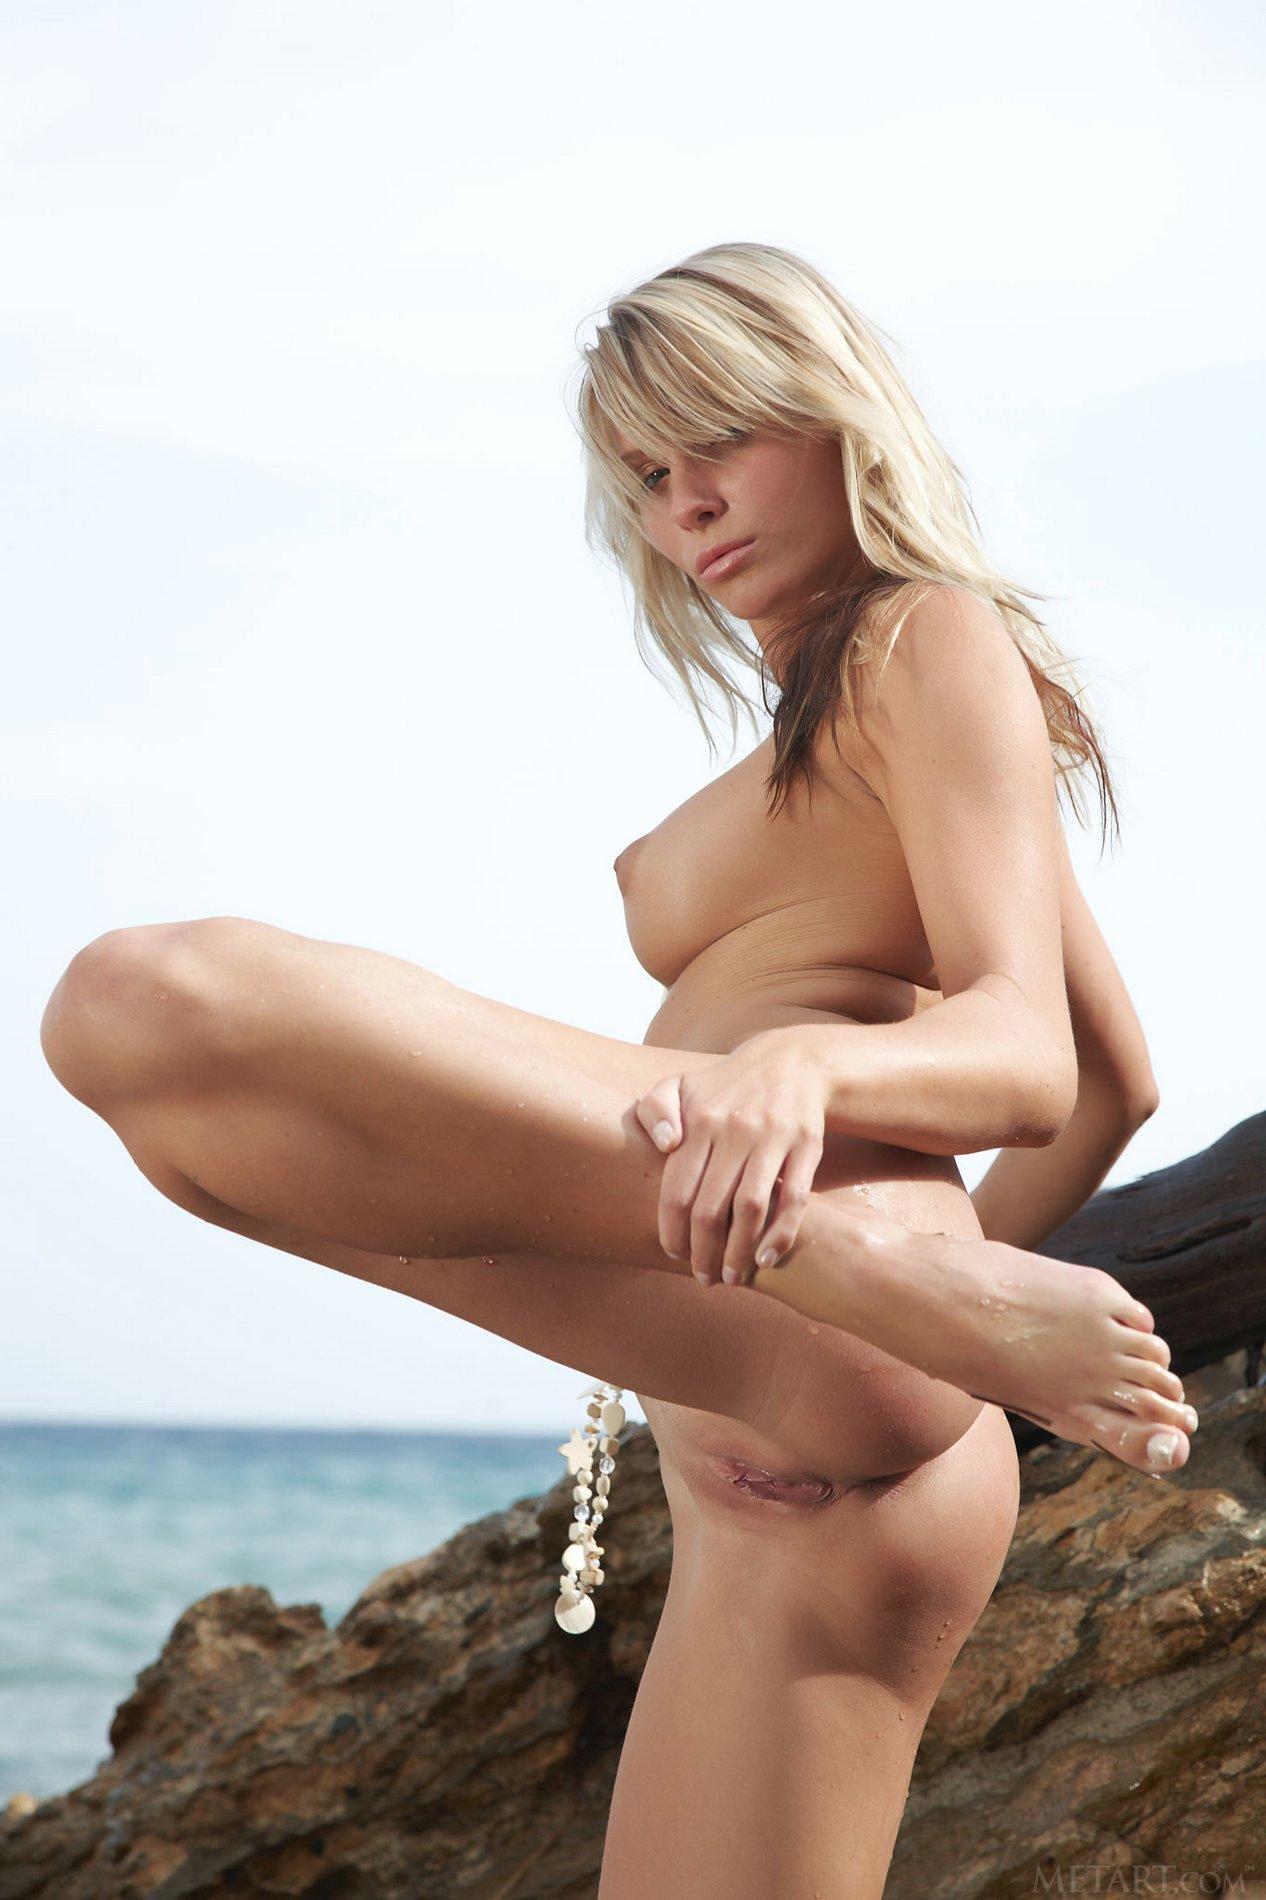 Heather Wild shows off her wet naked body - My Pornstar Book